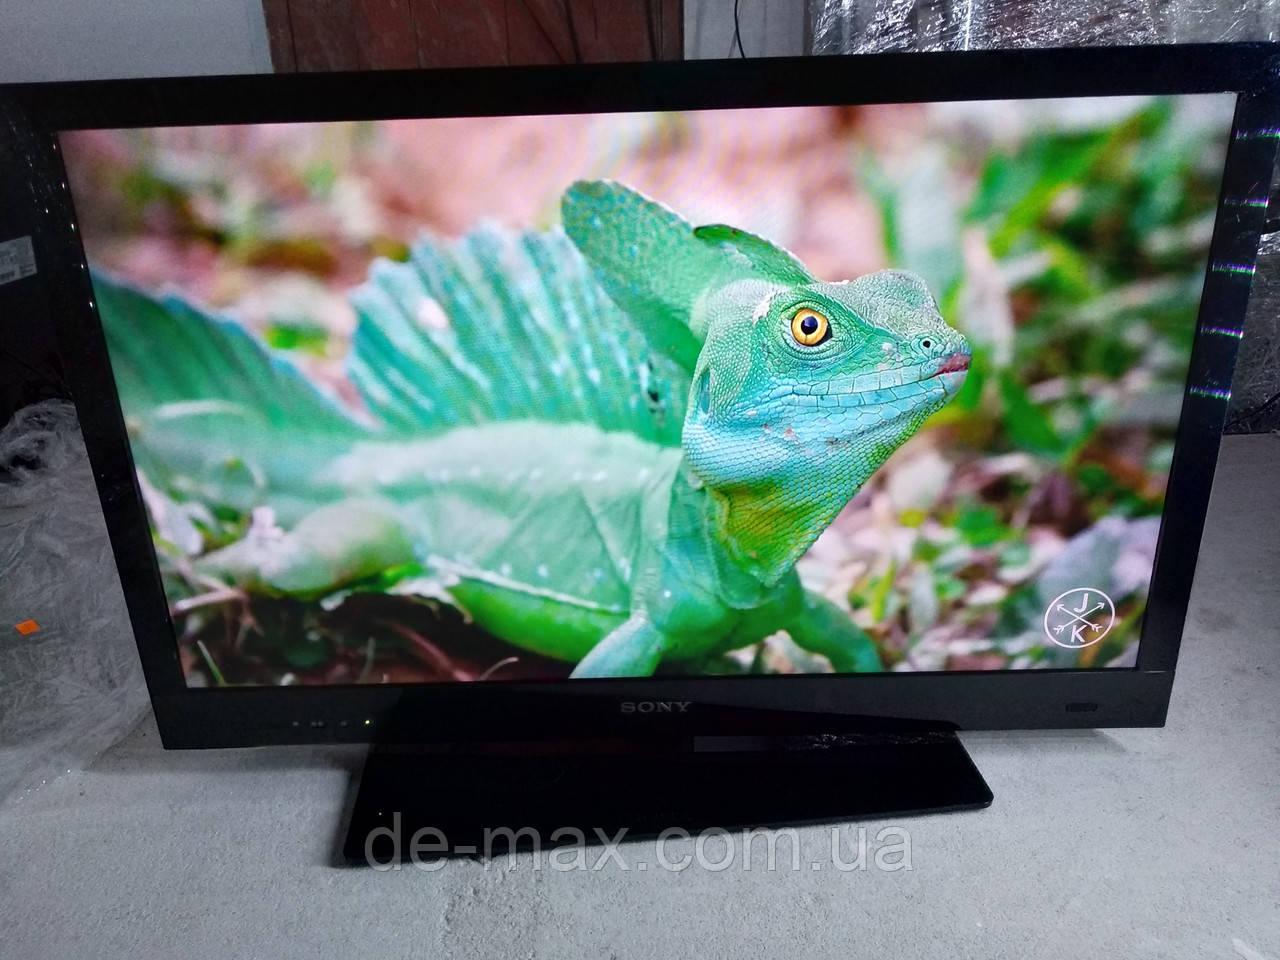 Телевизор 37 дюймов Philips 37PFL3507H 100Гц Full HD Smart TV